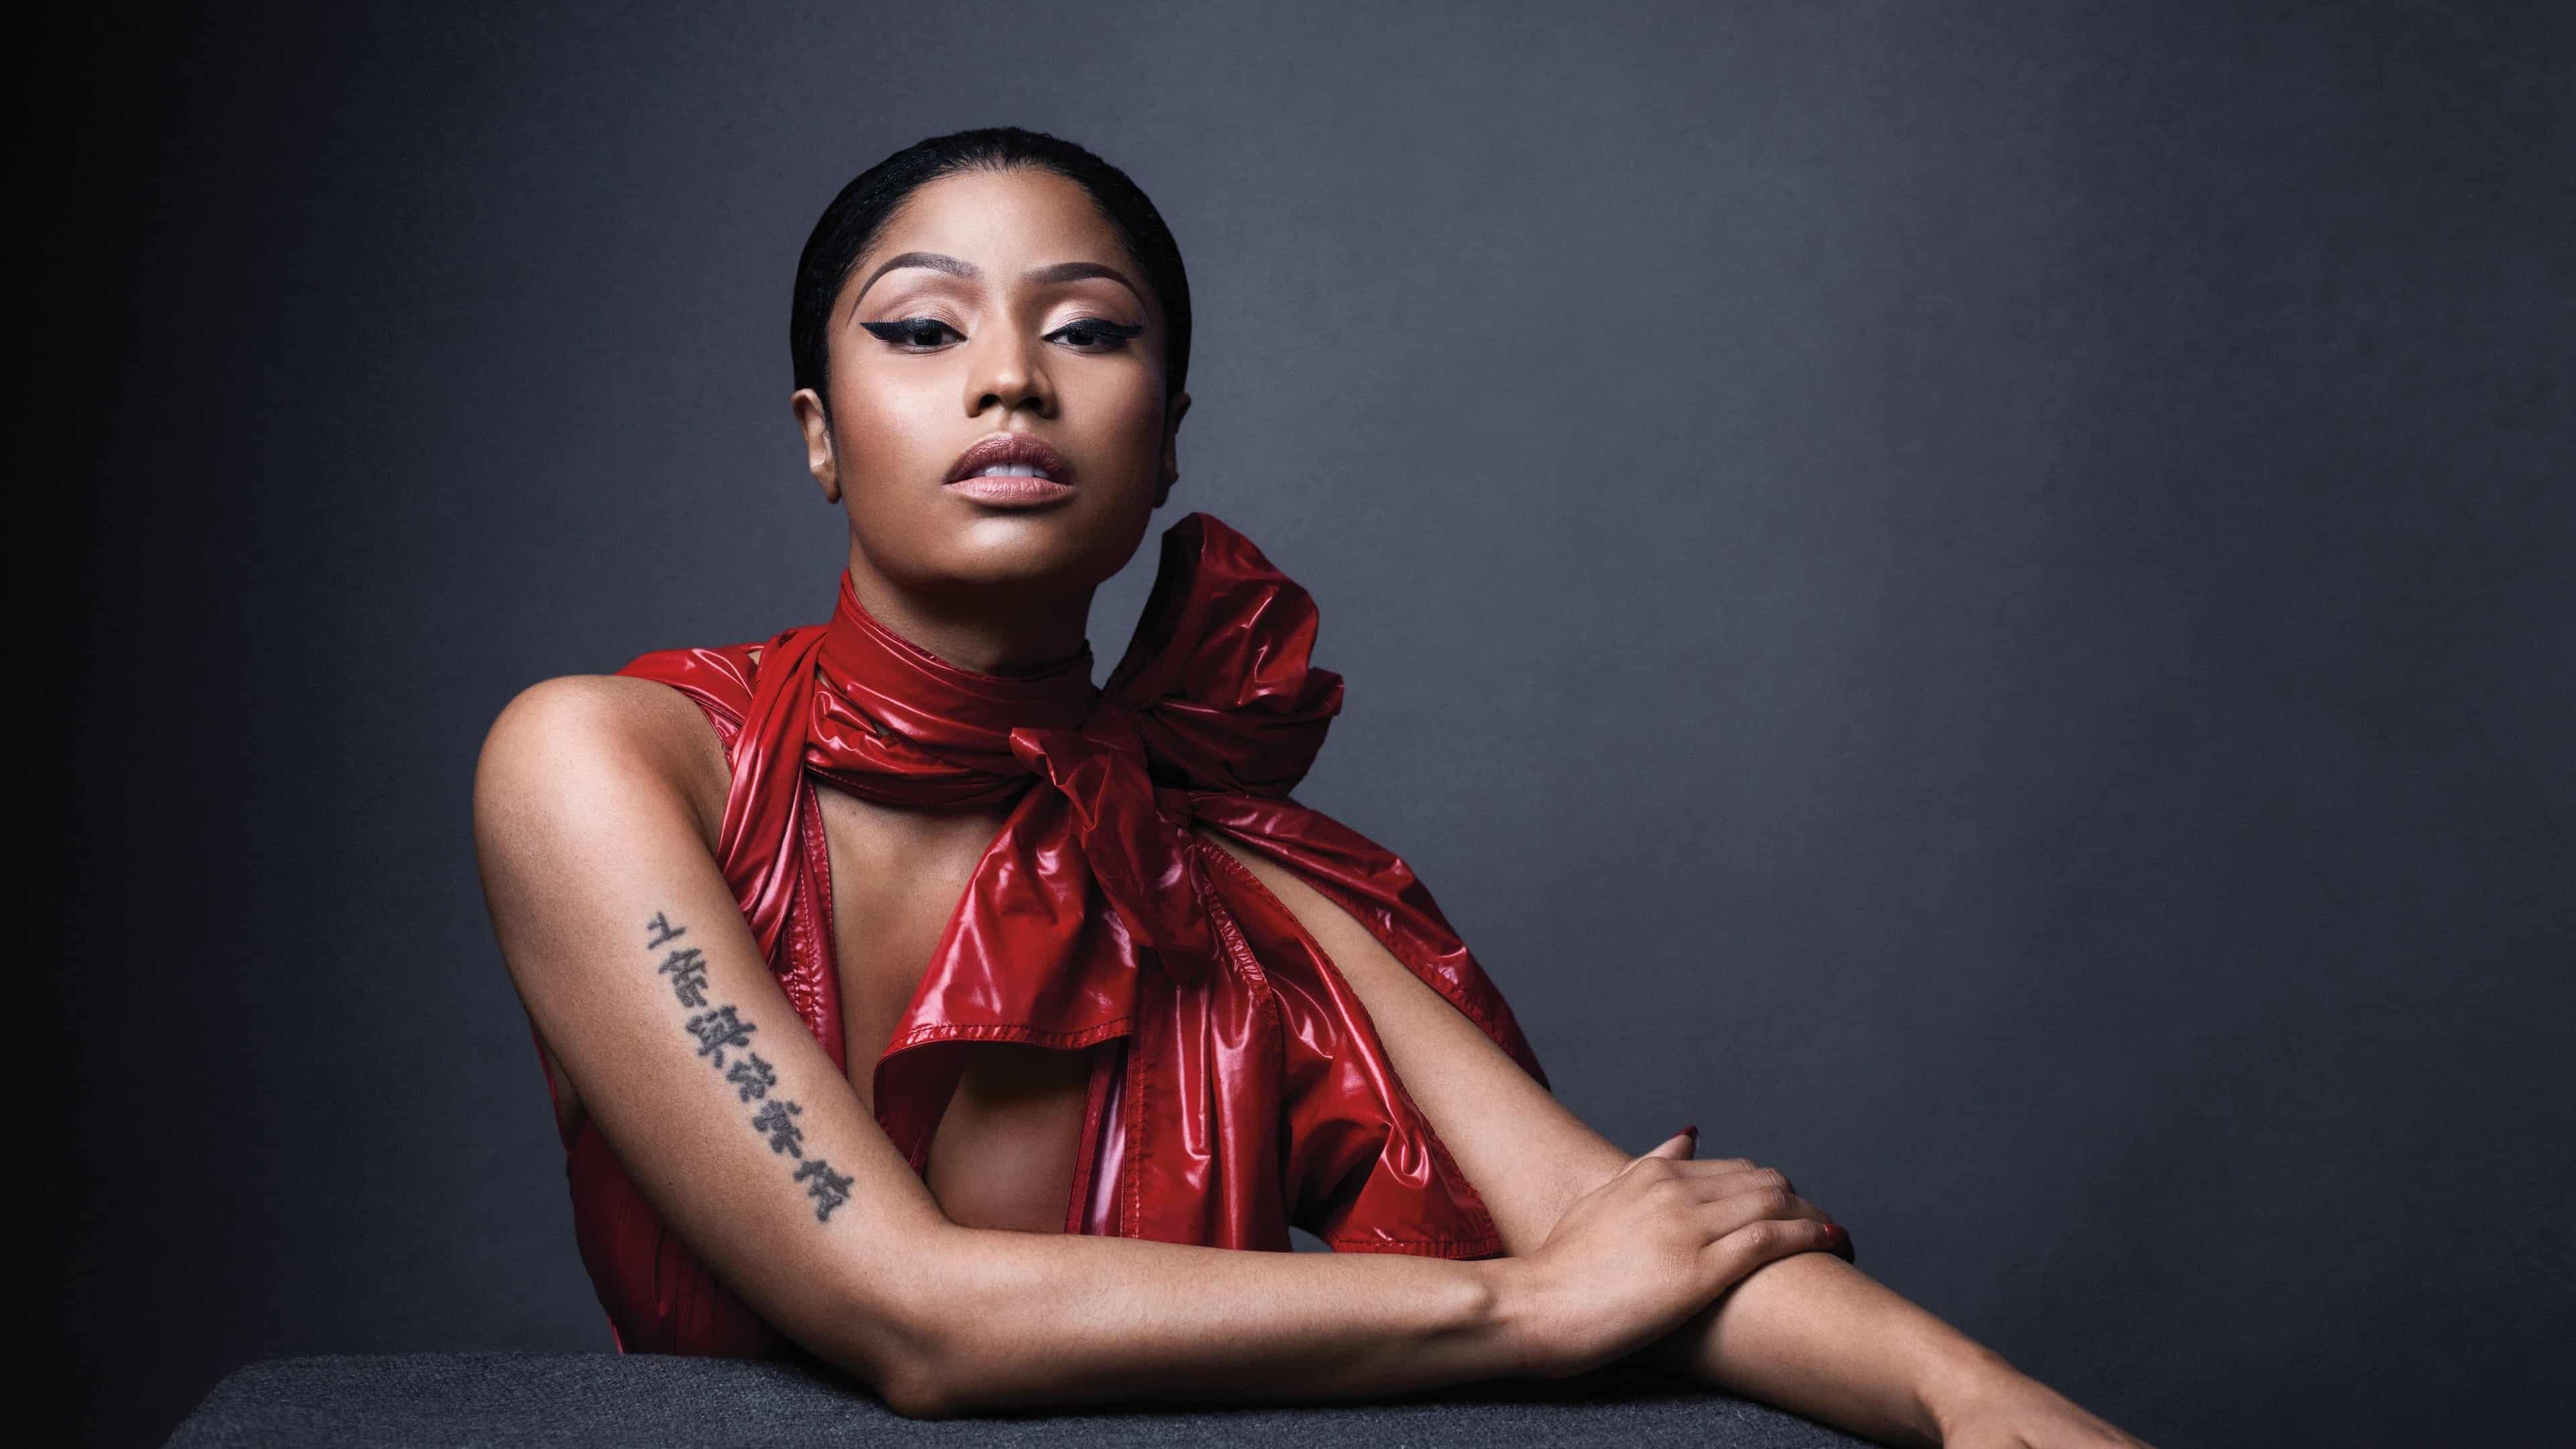 Nicki Minaj 2019 Wallpapers Wallpaper Cave